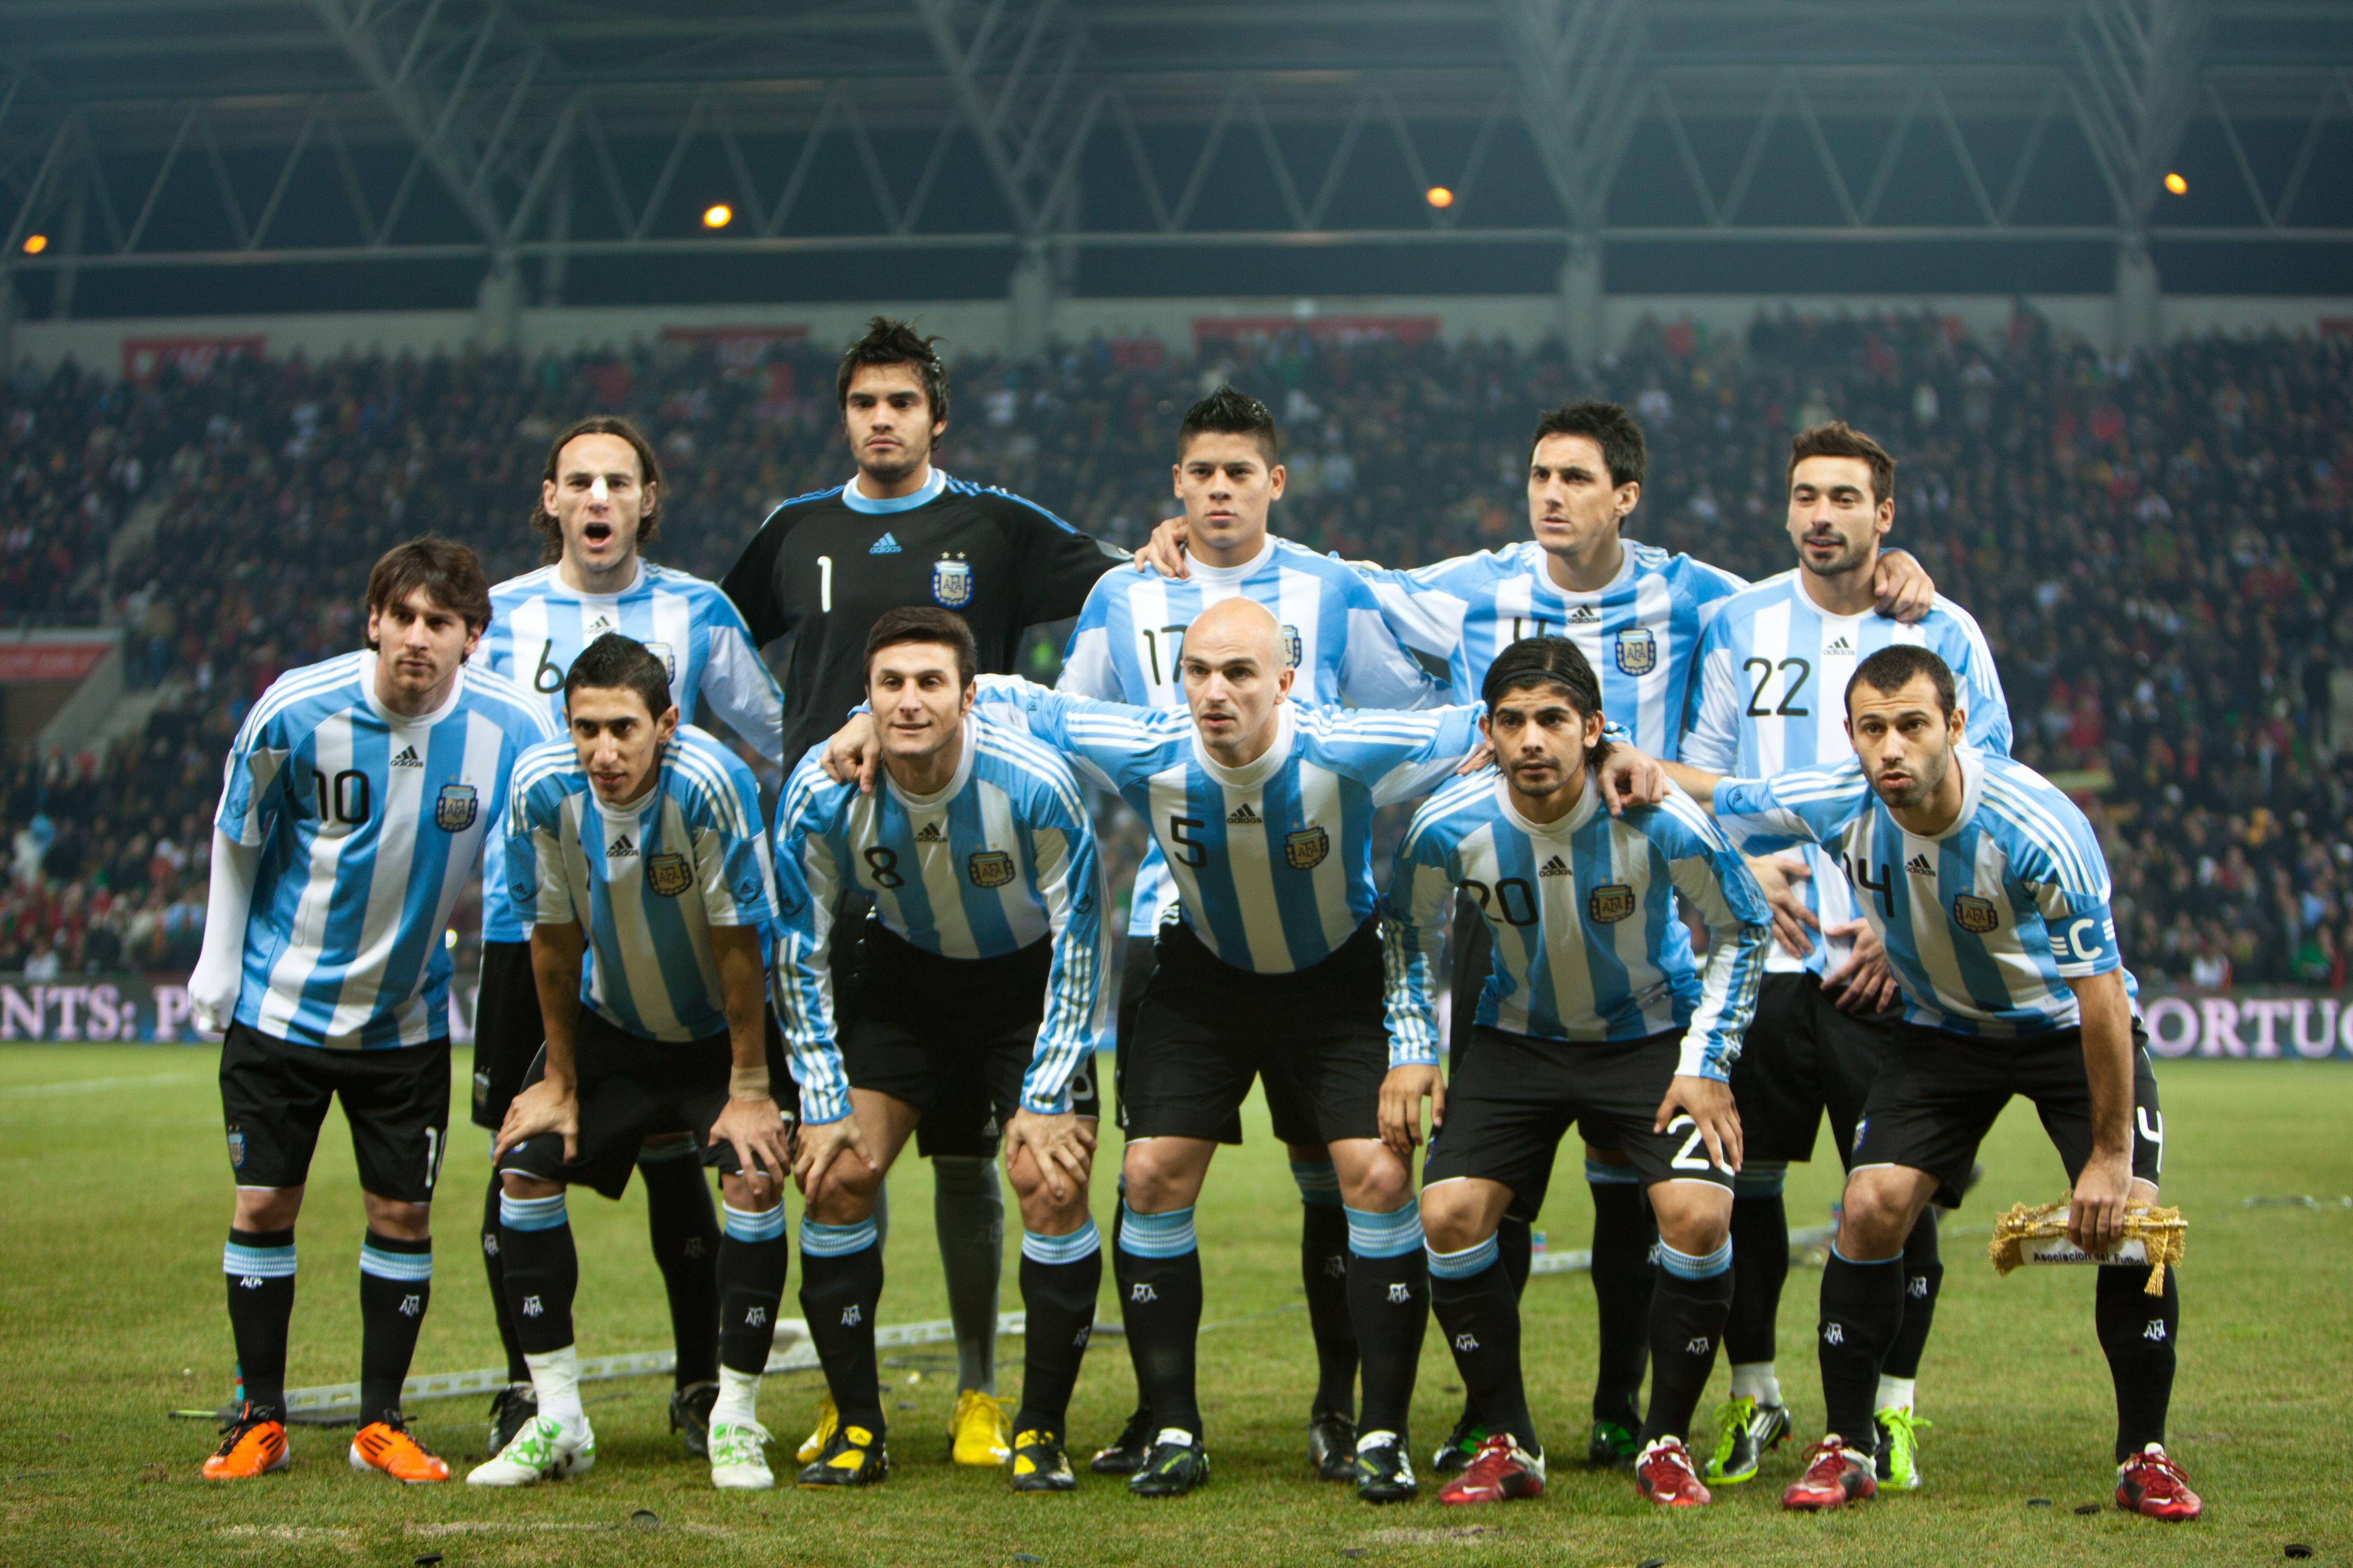 argentina fútbol - Una equipo  3e2b74ba91e05